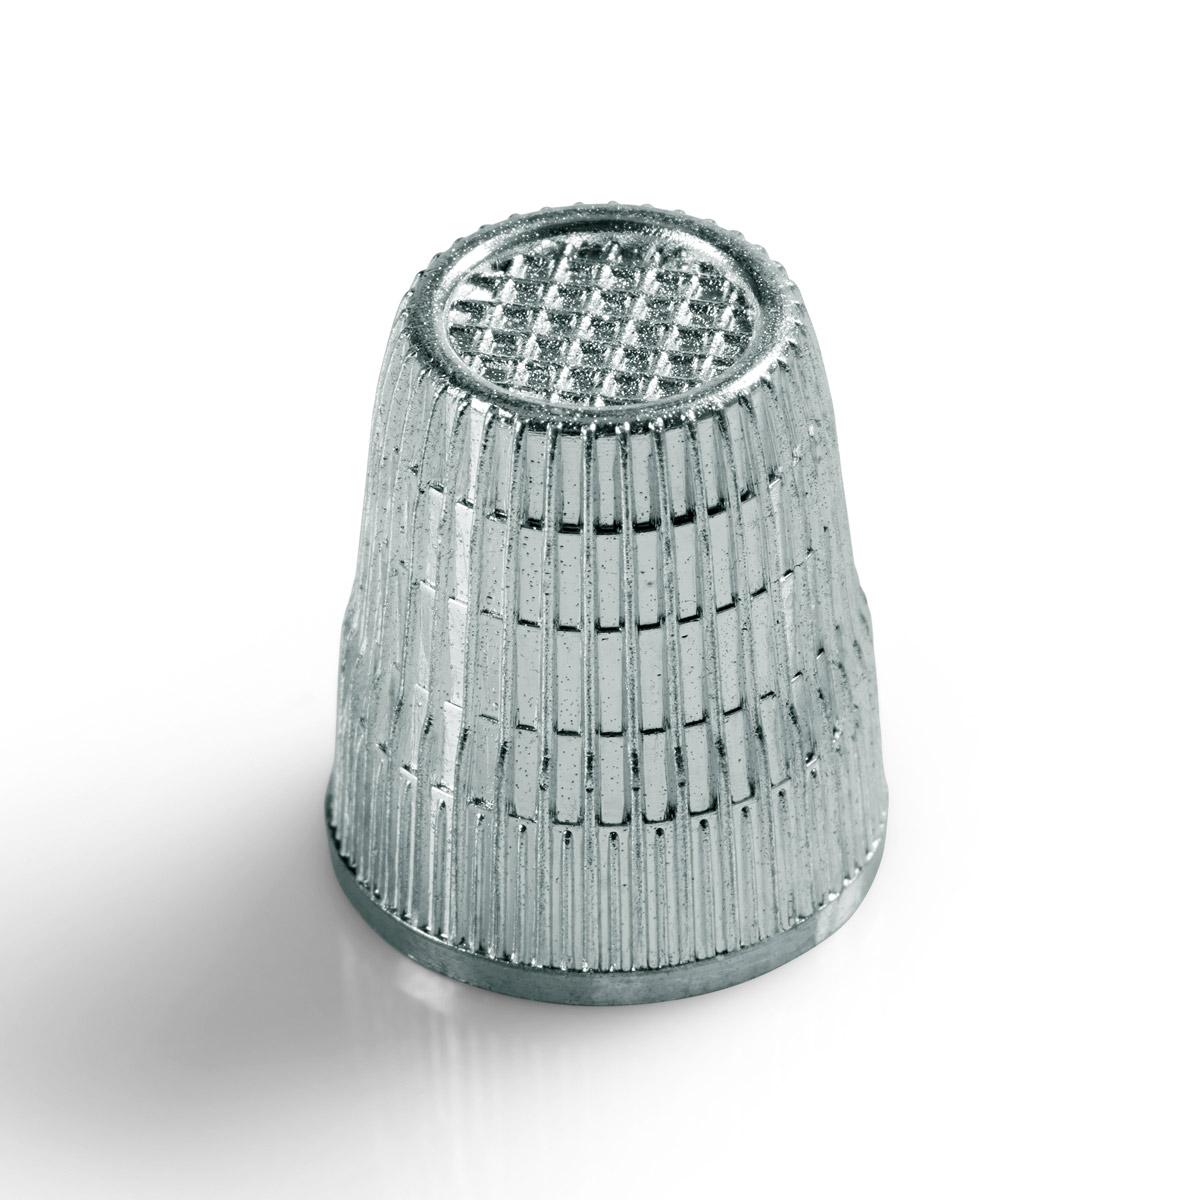 431841 Наперсток, цинк, хромовое покр., серебристый цв. 18 мм Prym